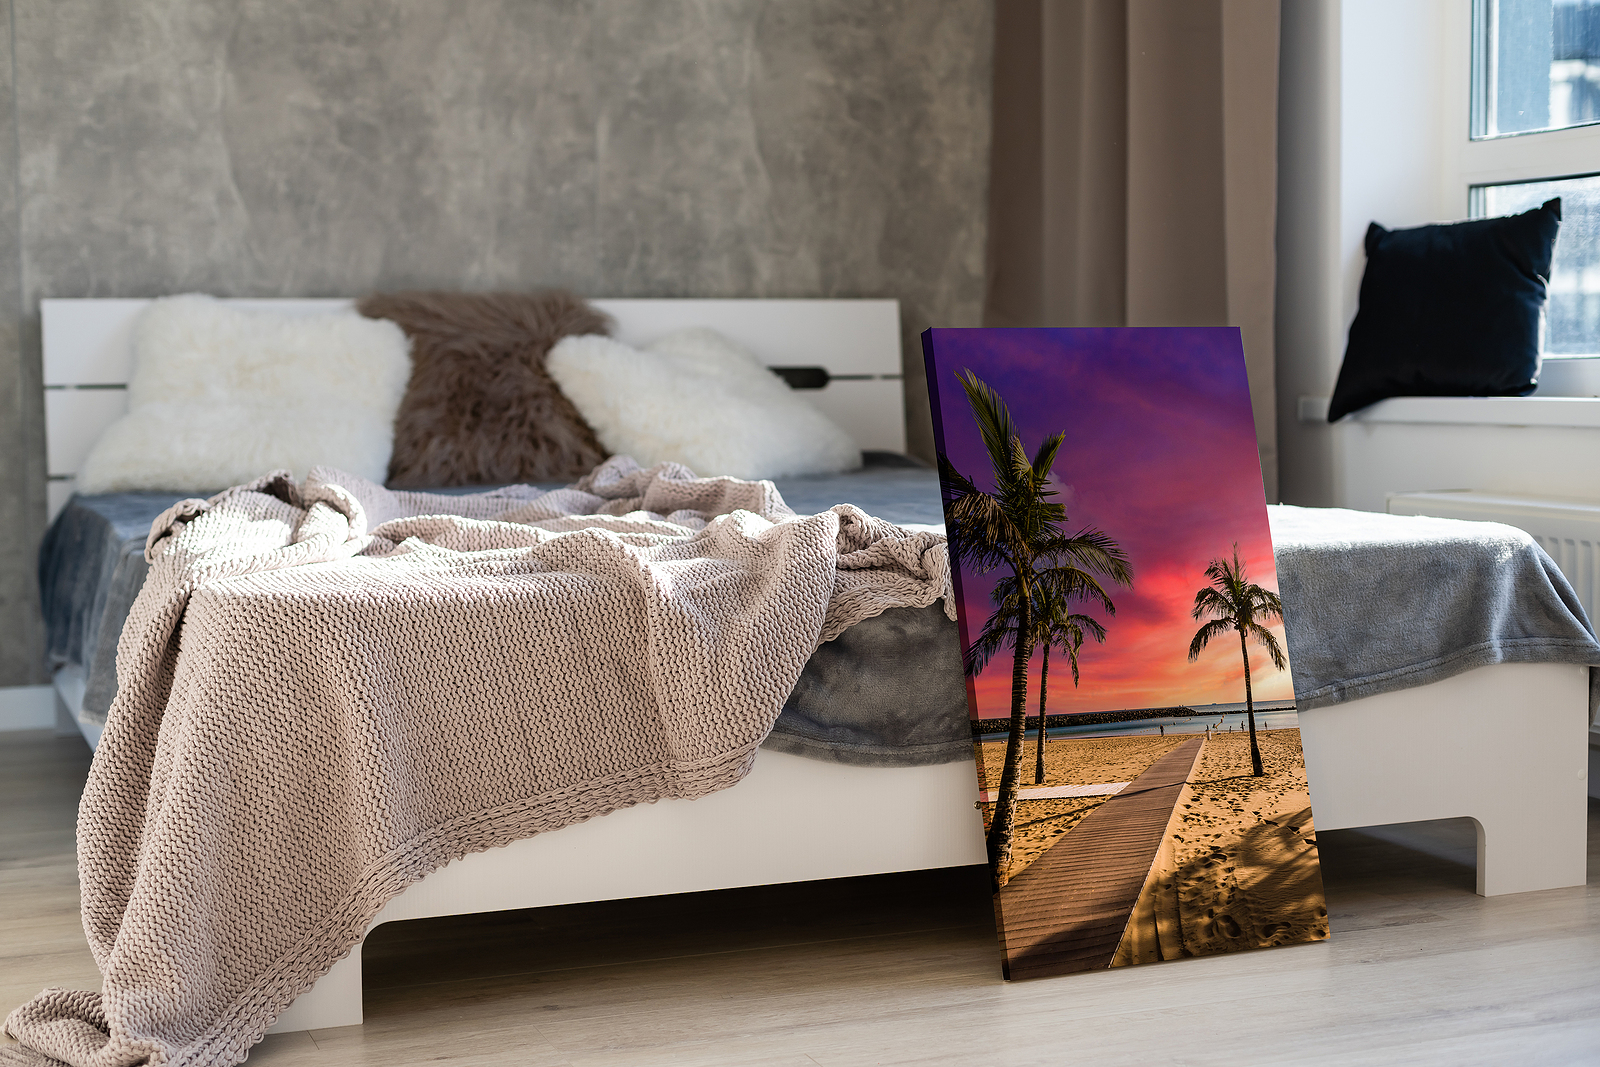 How to Choose the Best Fine Art Logistics Company